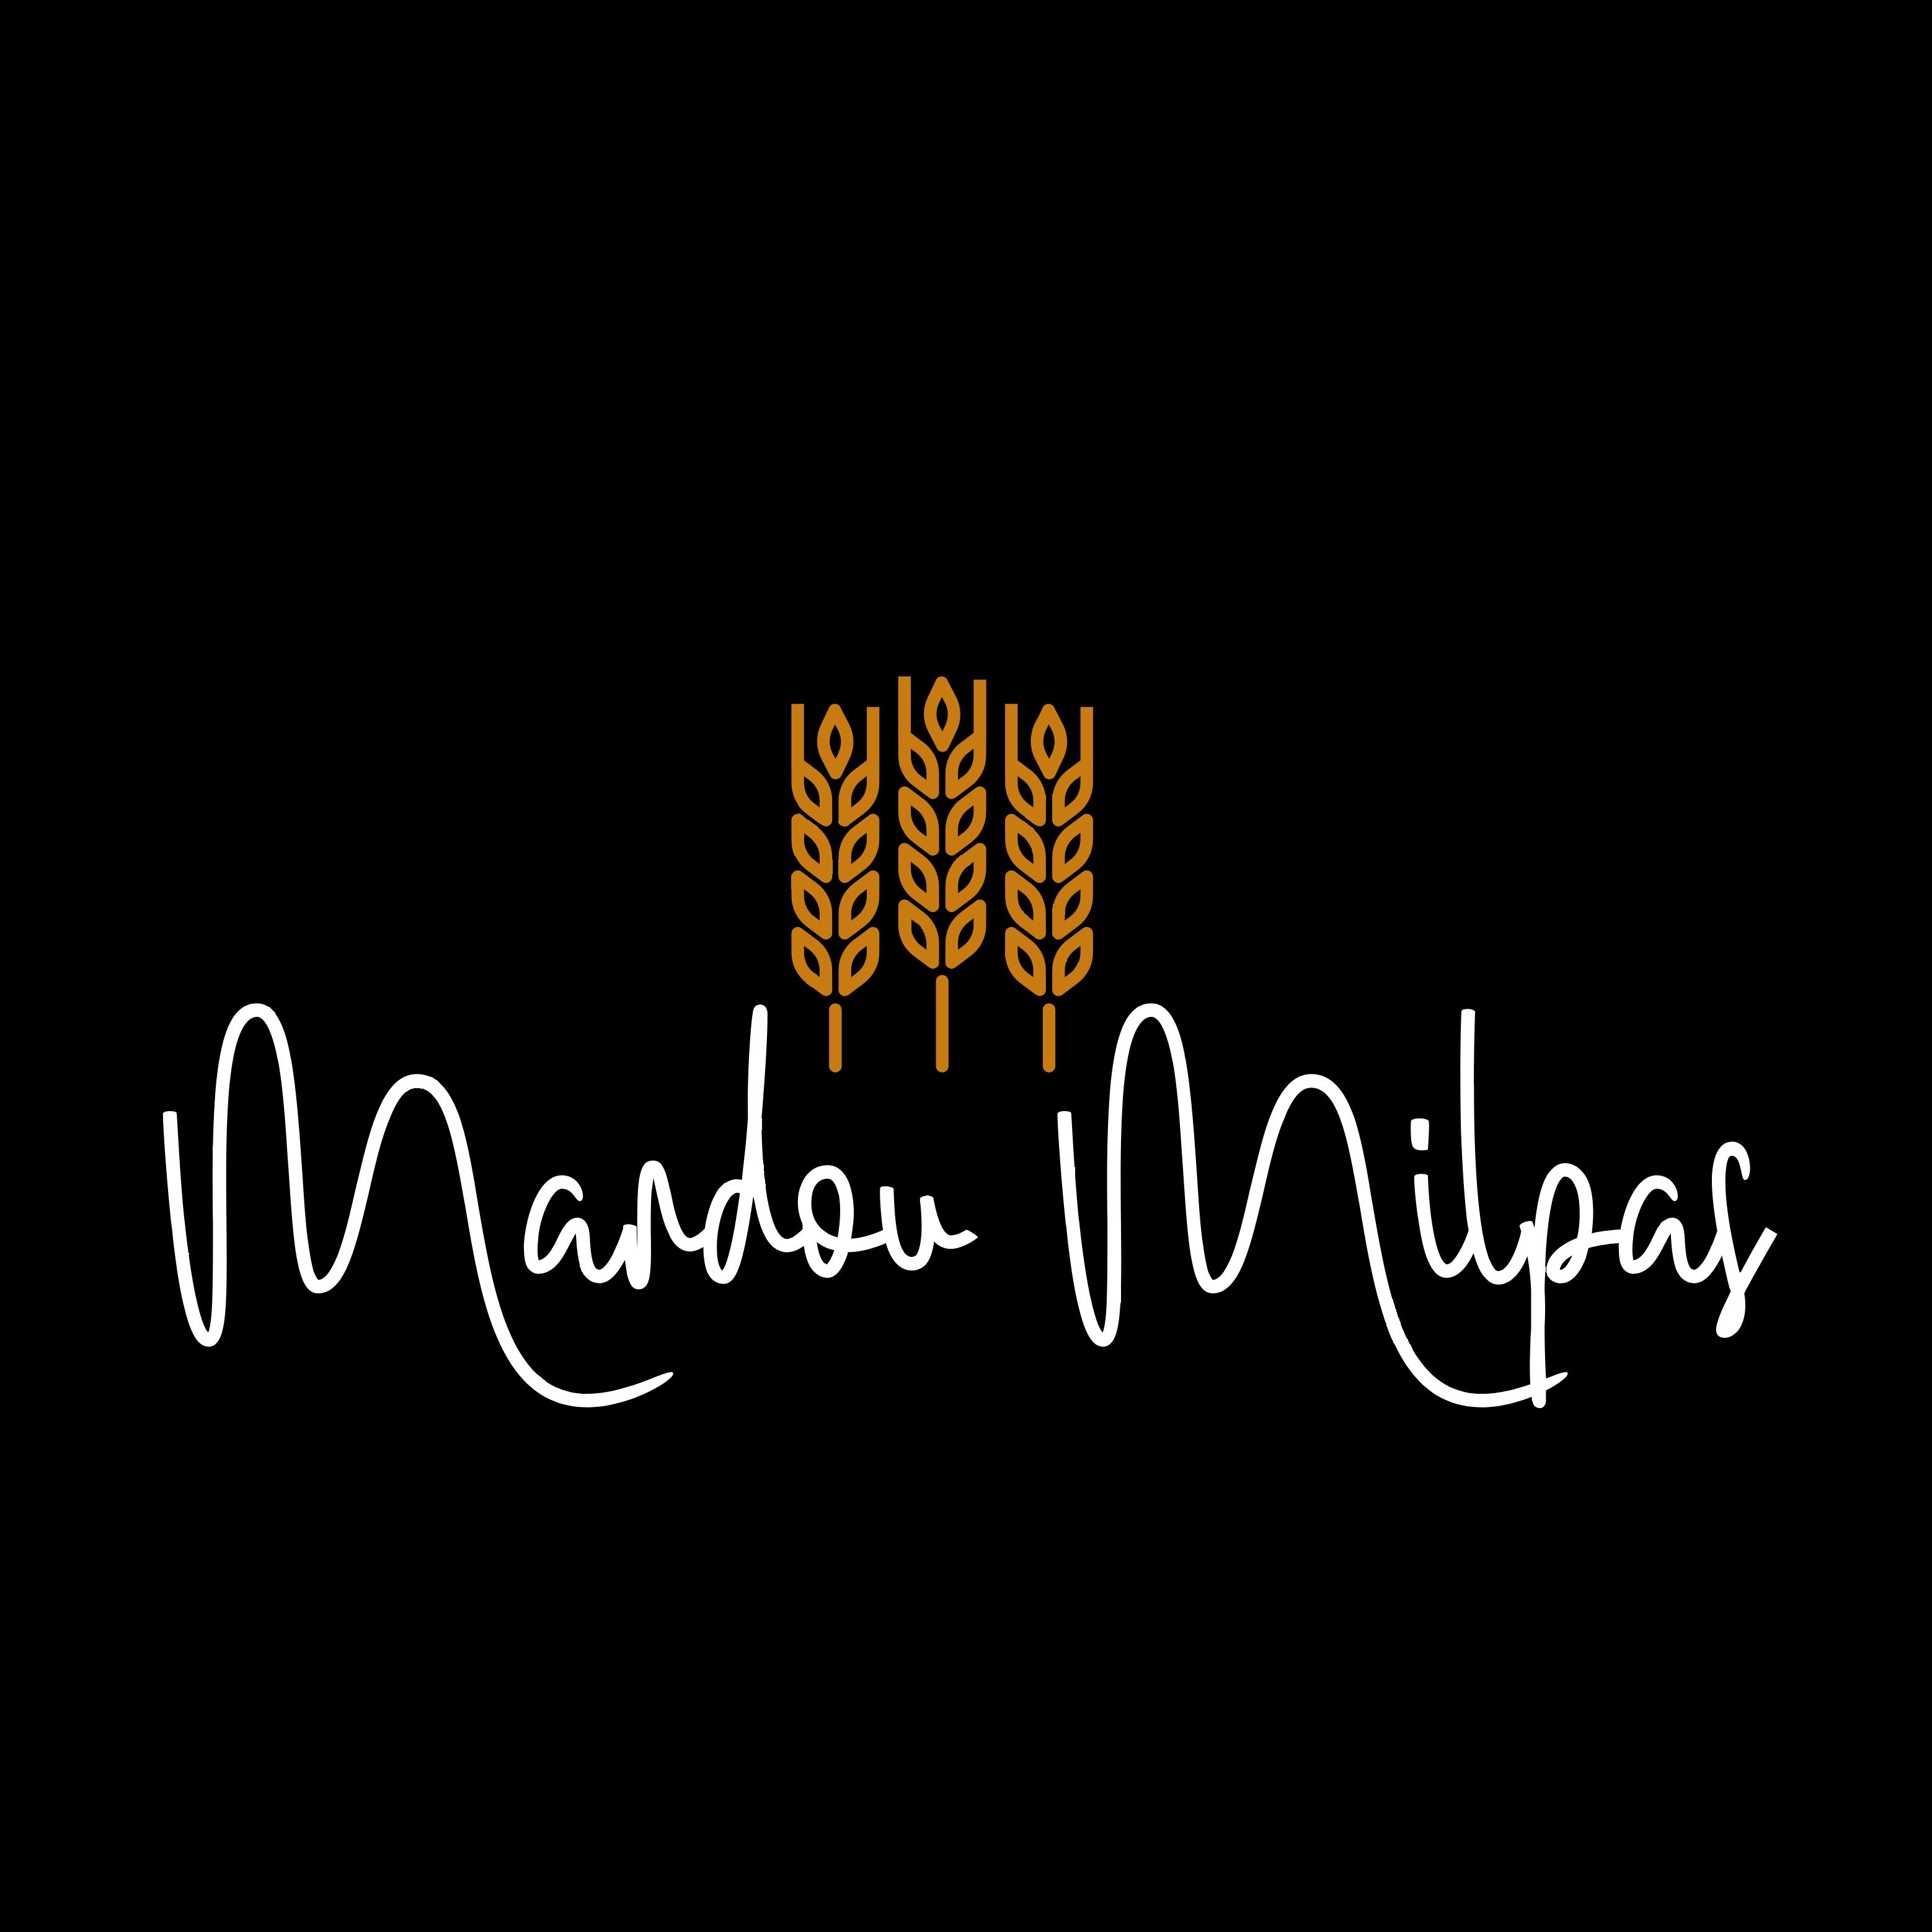 Mardou Milpas